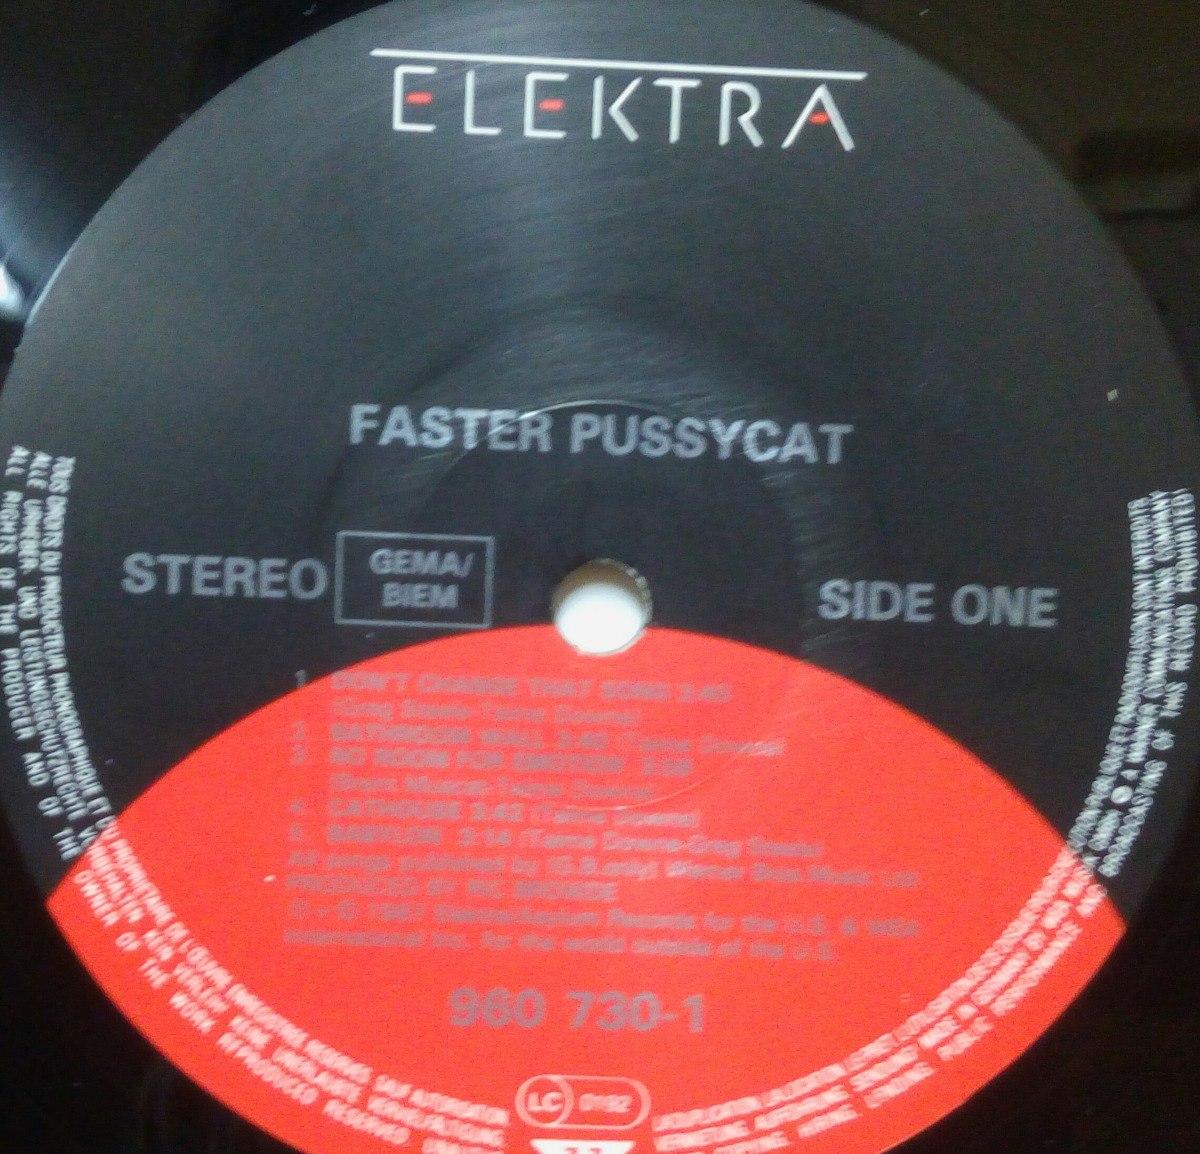 10 Elektra Faster-pussycat-vinyl-aleman-faster-pussycat-hrd-glm-mtx-vnl-D_NQ_NP_956117-MLM26405064630_112017-F